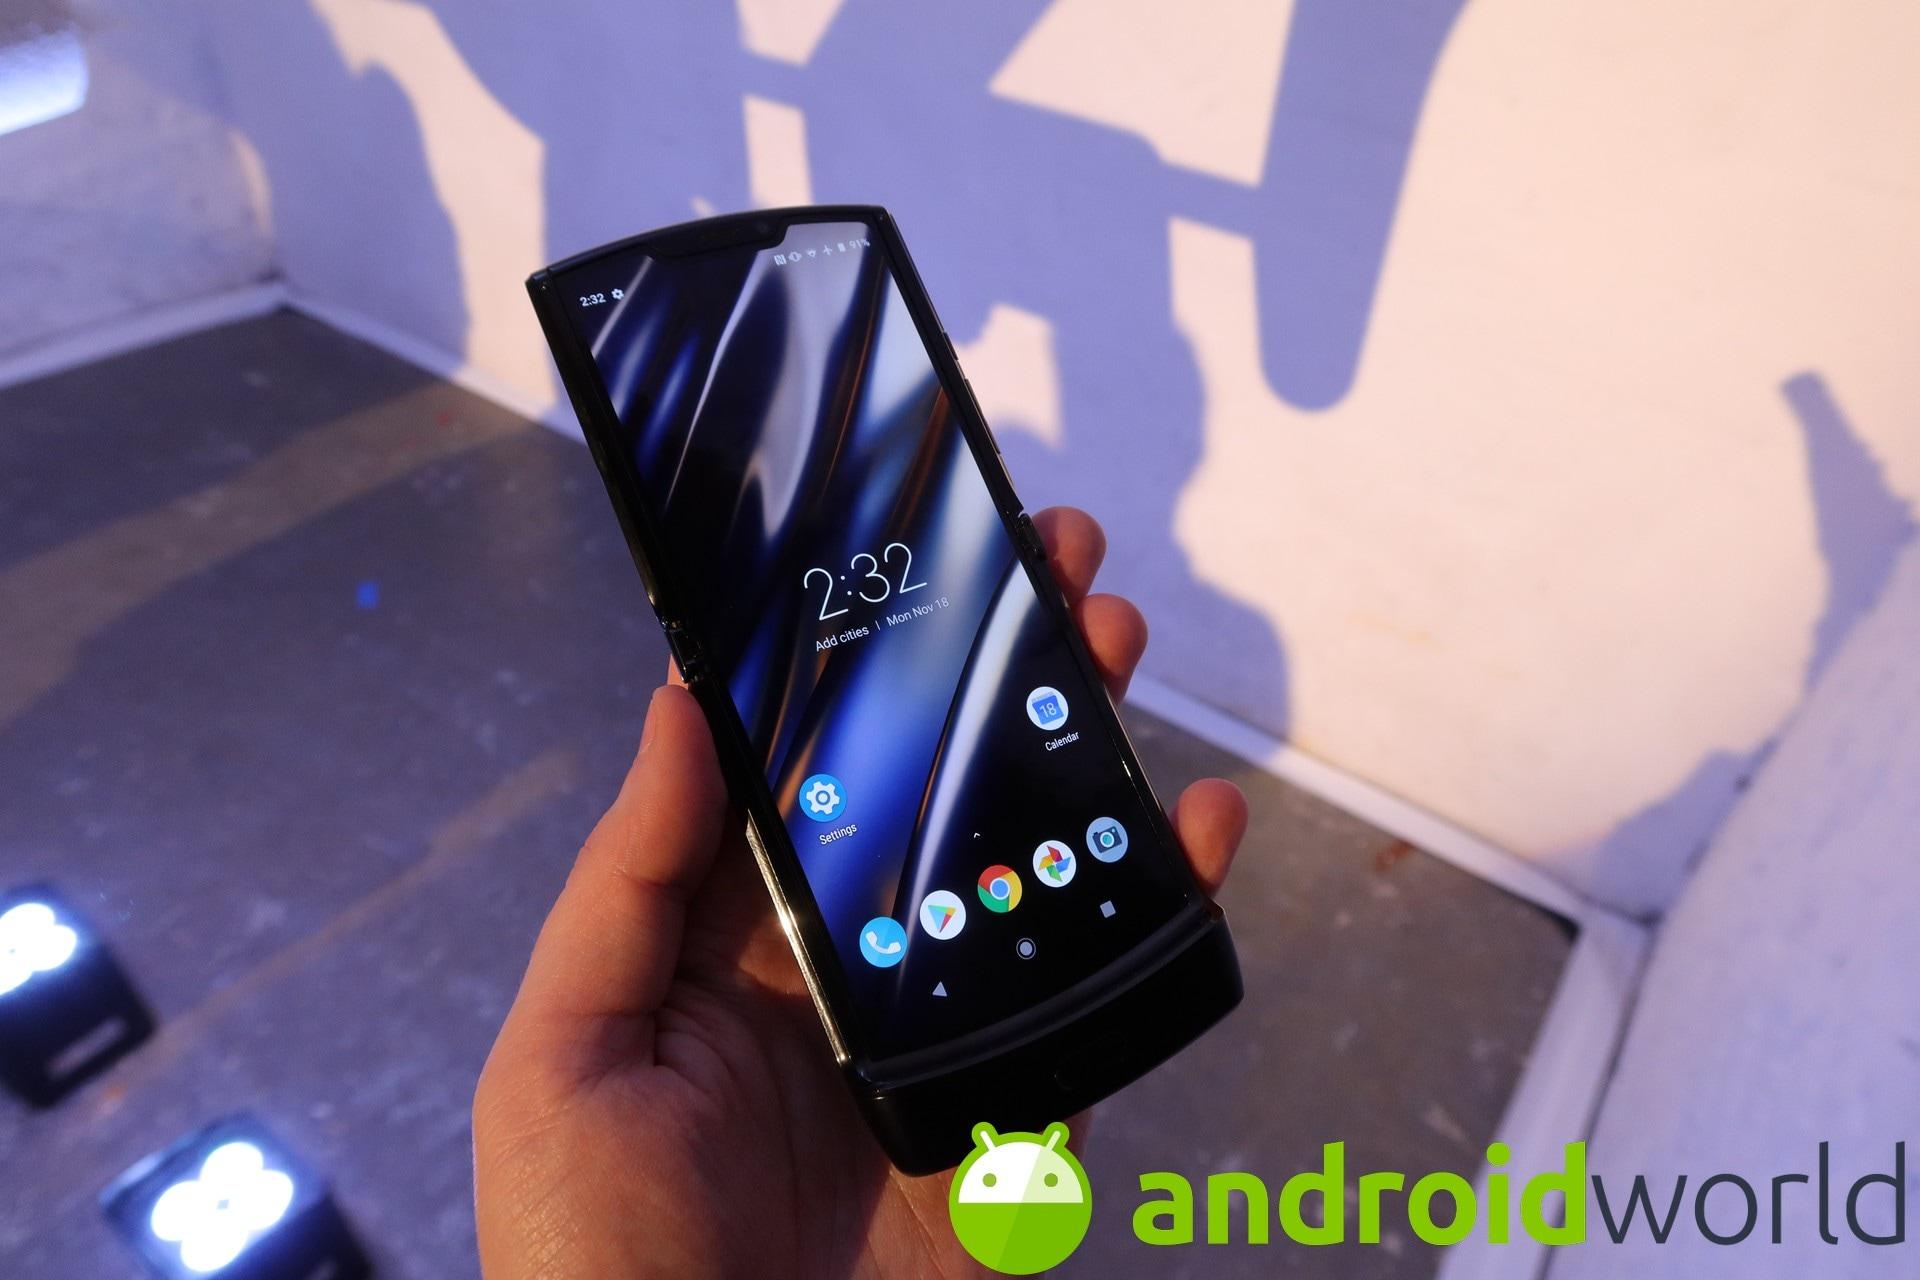 Motorola razr will arrive in Italy tomorrow, but woe to drop it